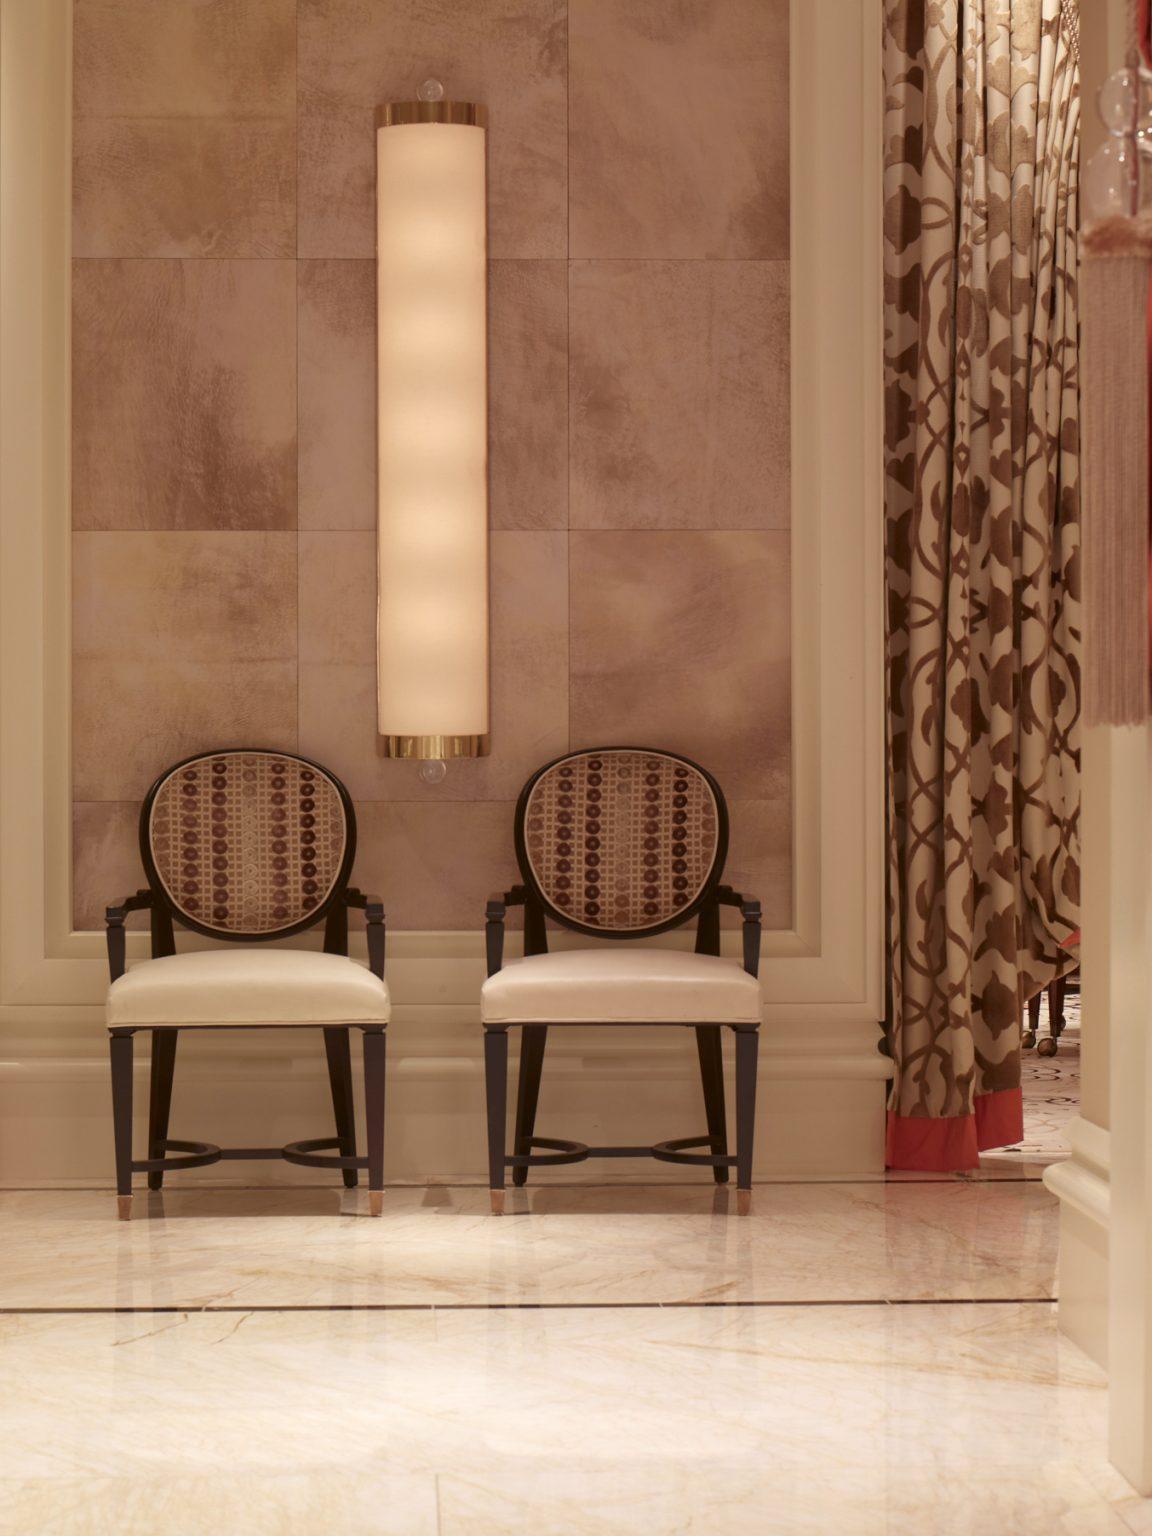 Wynn casino baccarat room tlc rtc faux parchment tiles 2 for Wynn design and development las vegas